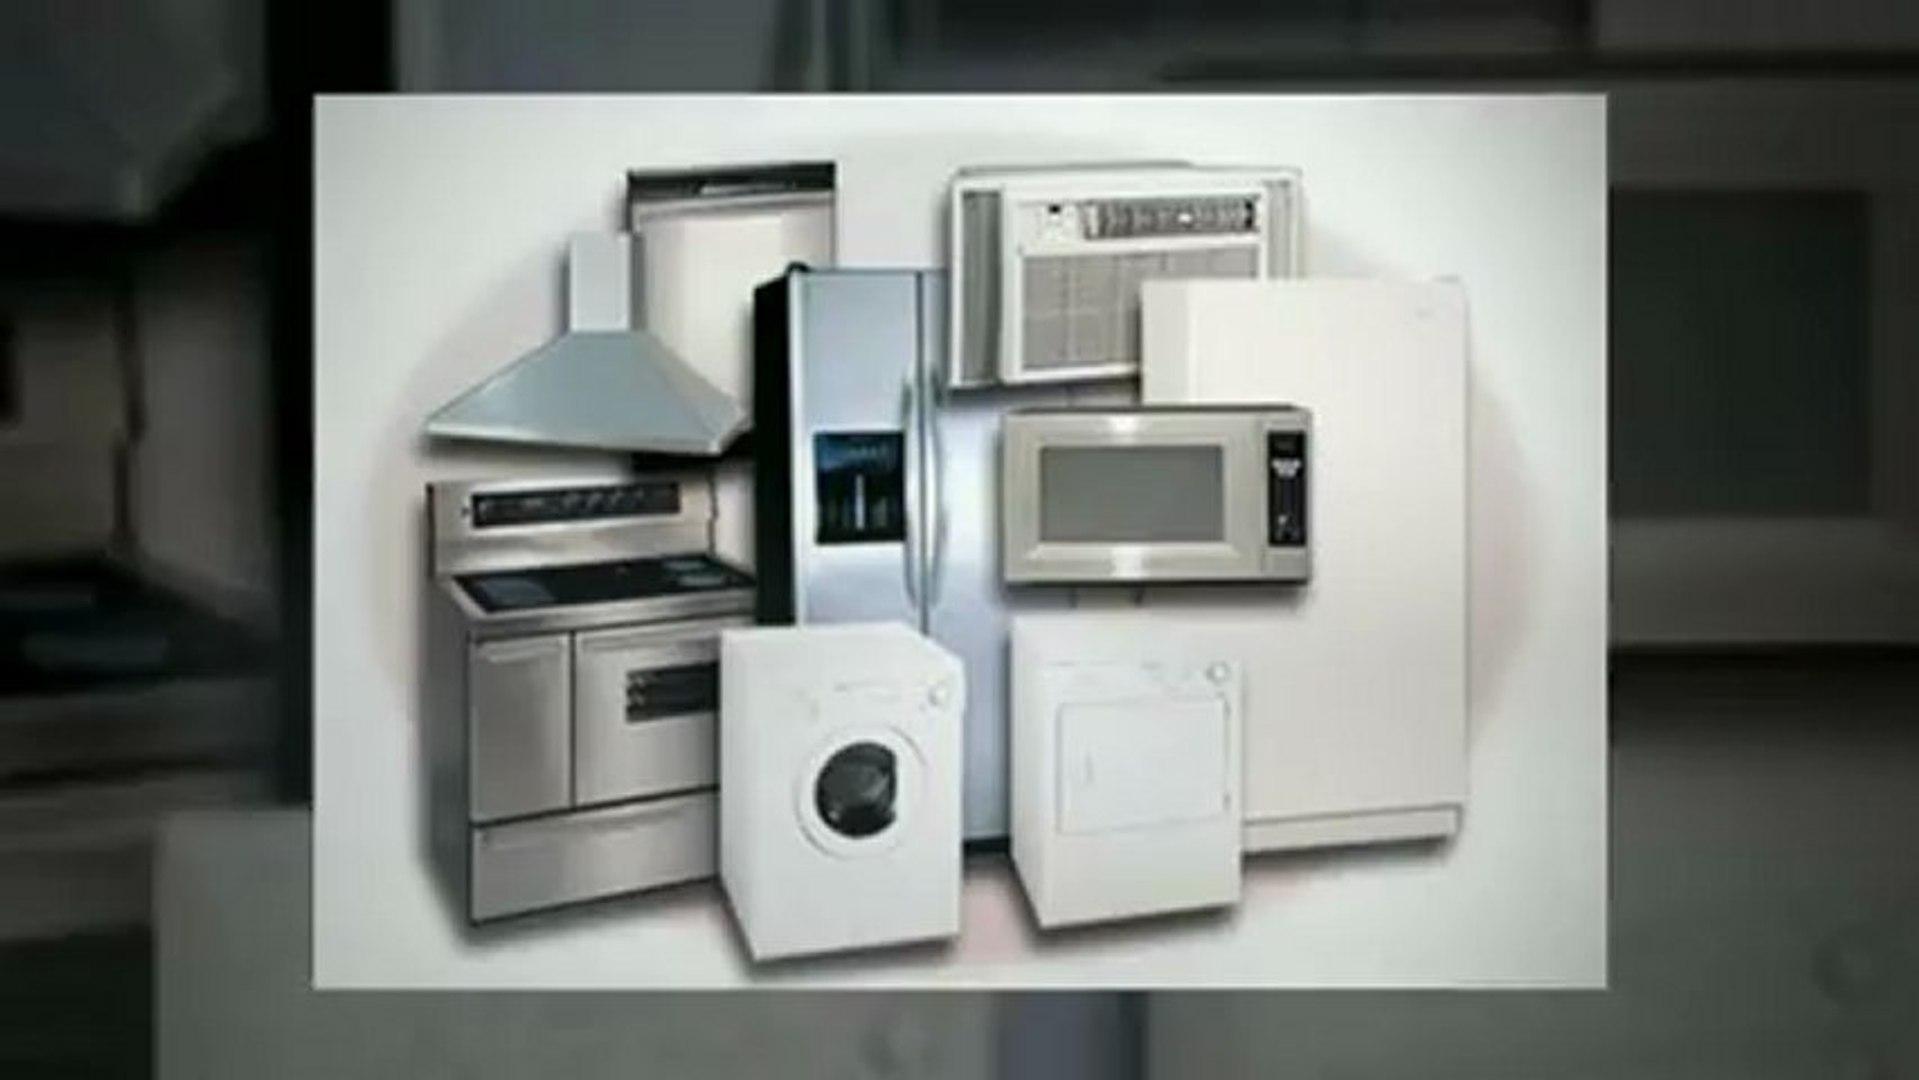 All Appliance repair in santa clarita Ca Call 415-689-8180